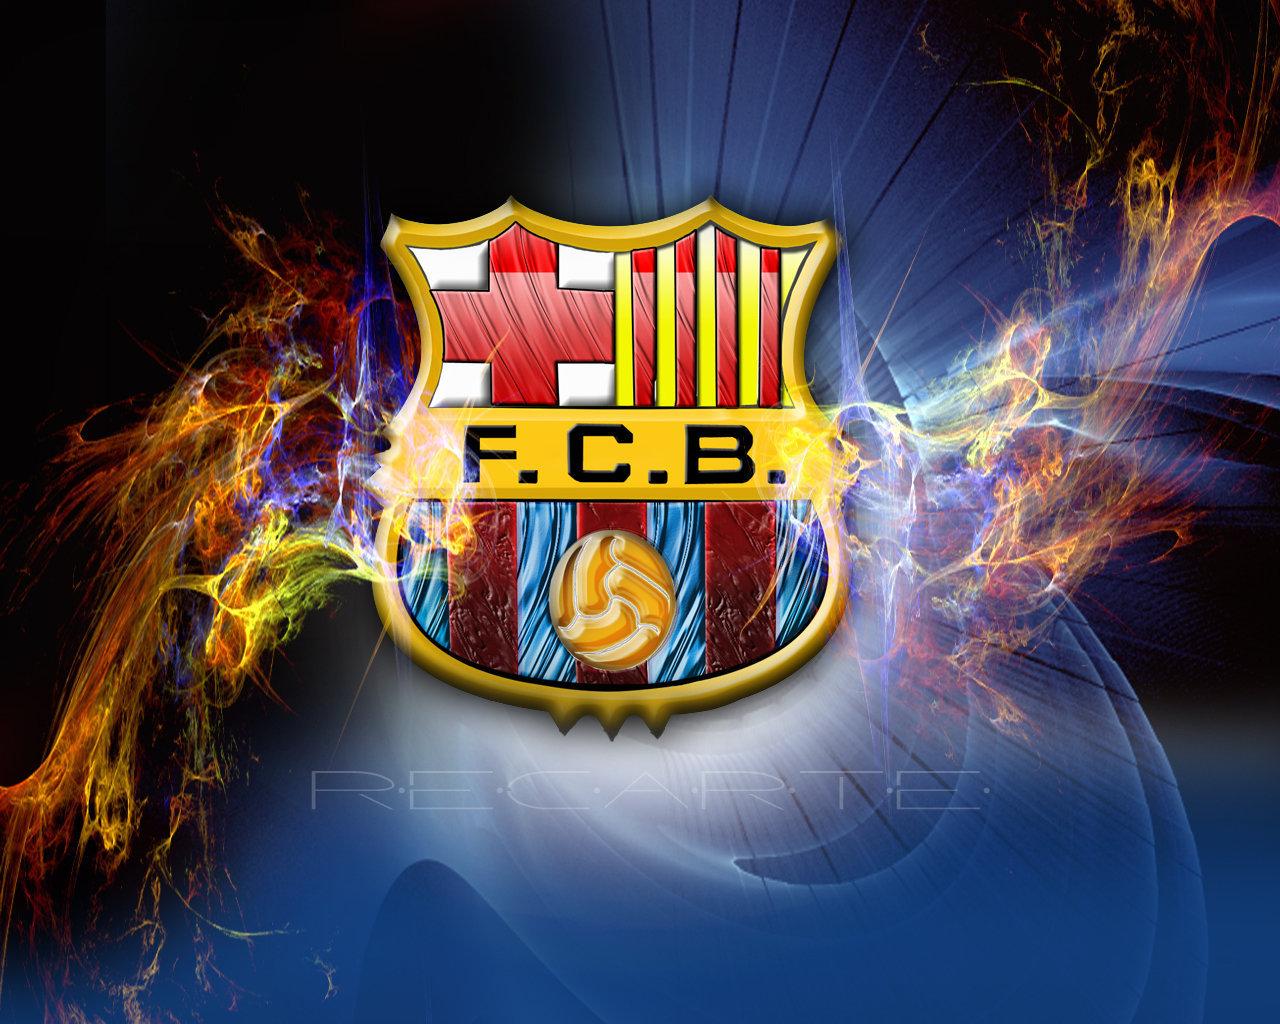 http://2.bp.blogspot.com/-v-xg3llwH34/US-IffBK7JI/AAAAAAAAfHM/f9Hb-RLcCUo/s1600/FC-Barcelona-Logo-Wallpaper-fc-barcelona-22614314-1280-1024.jpg